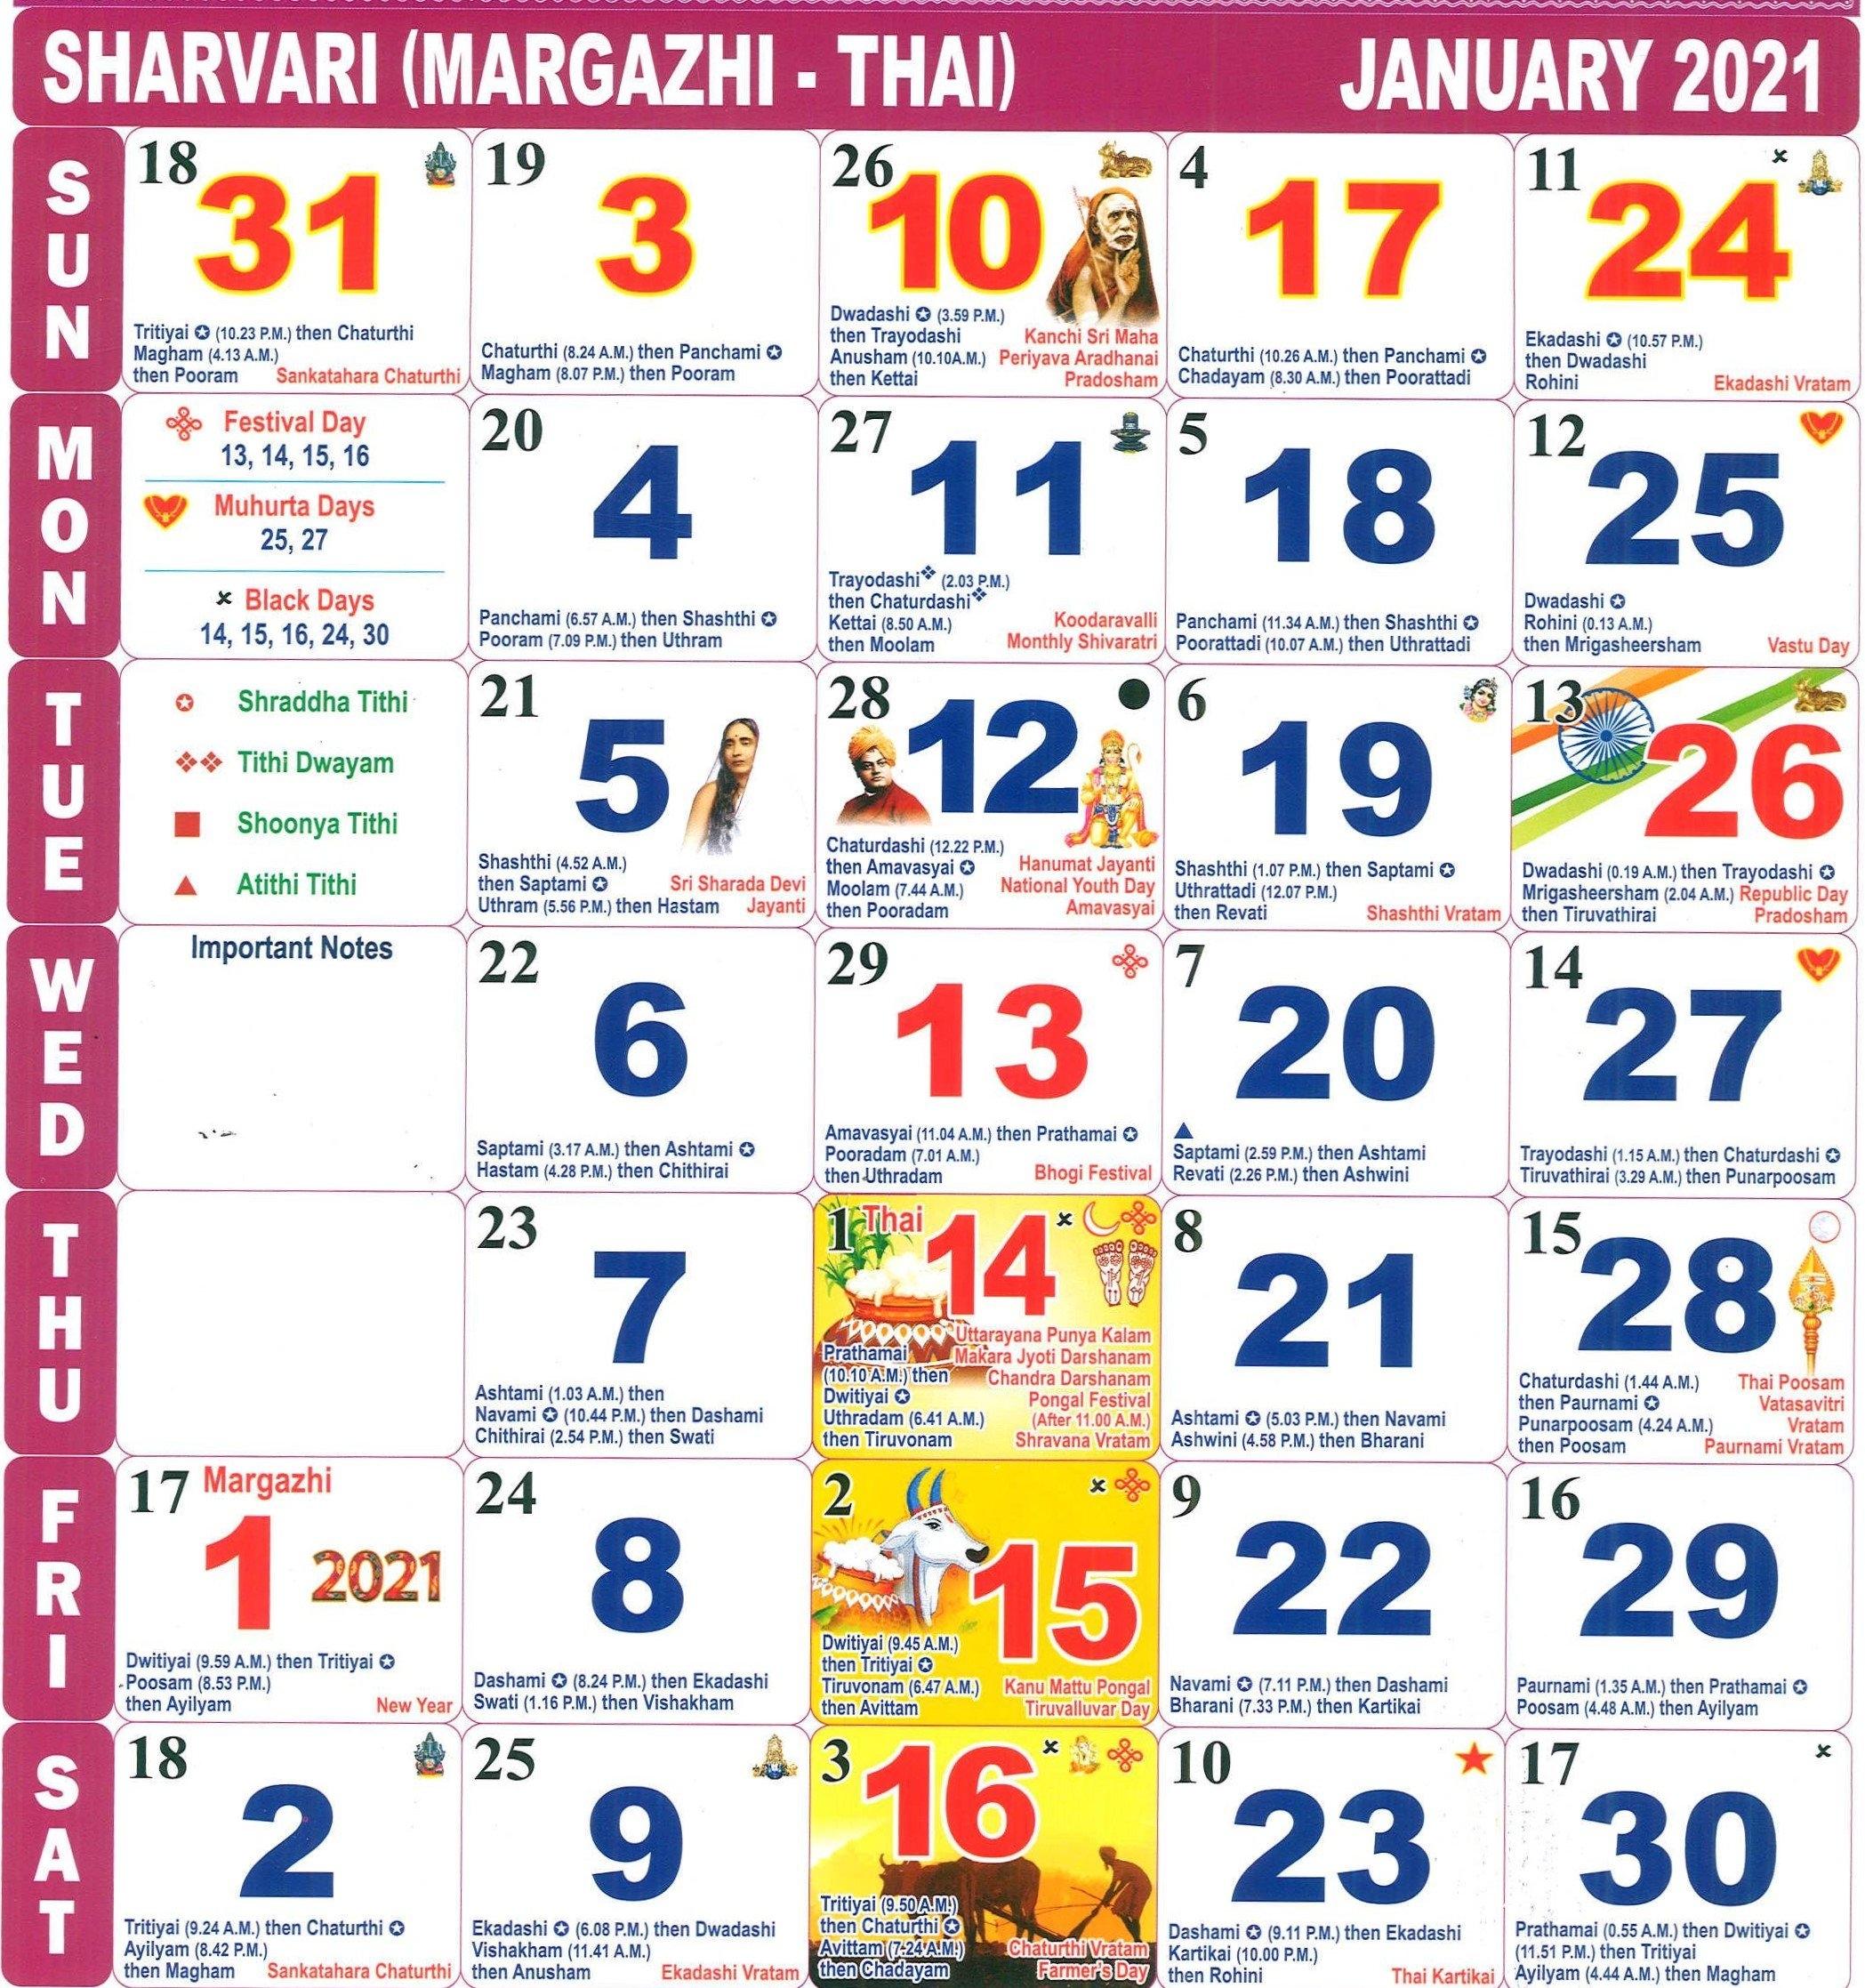 January 2021 Tamil Monthly Calendar January, Year 2021 | Tamil Month Calendar 2021 | Monthly throughout Tamil Calendar 2021 Photos